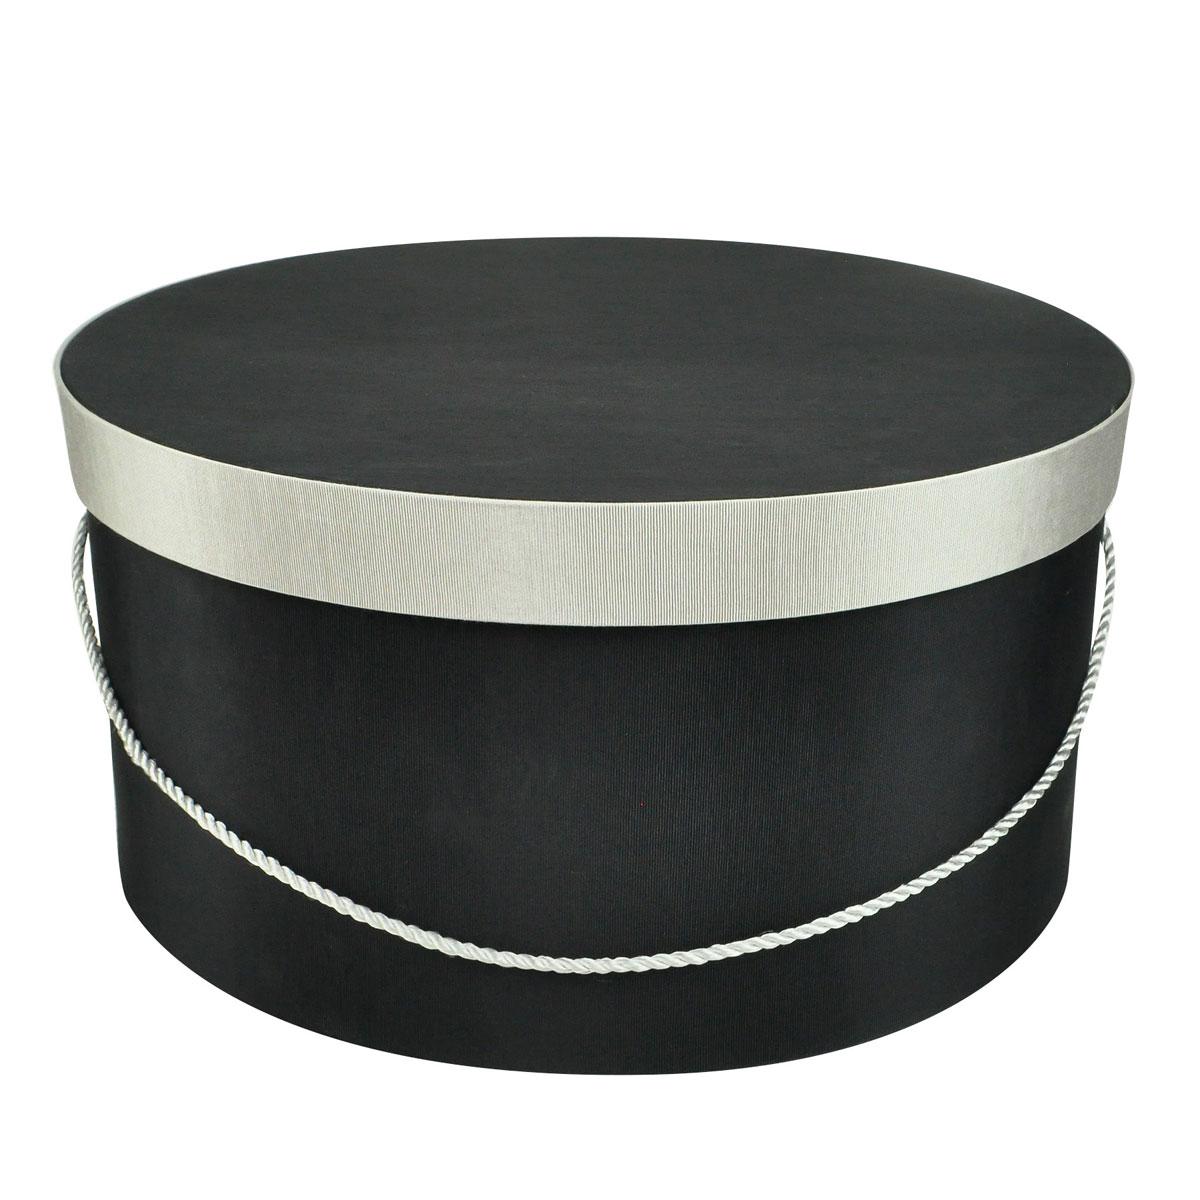 Retro Vintage Style Hats Small Round Hatbox $65.00 AT vintagedancer.com